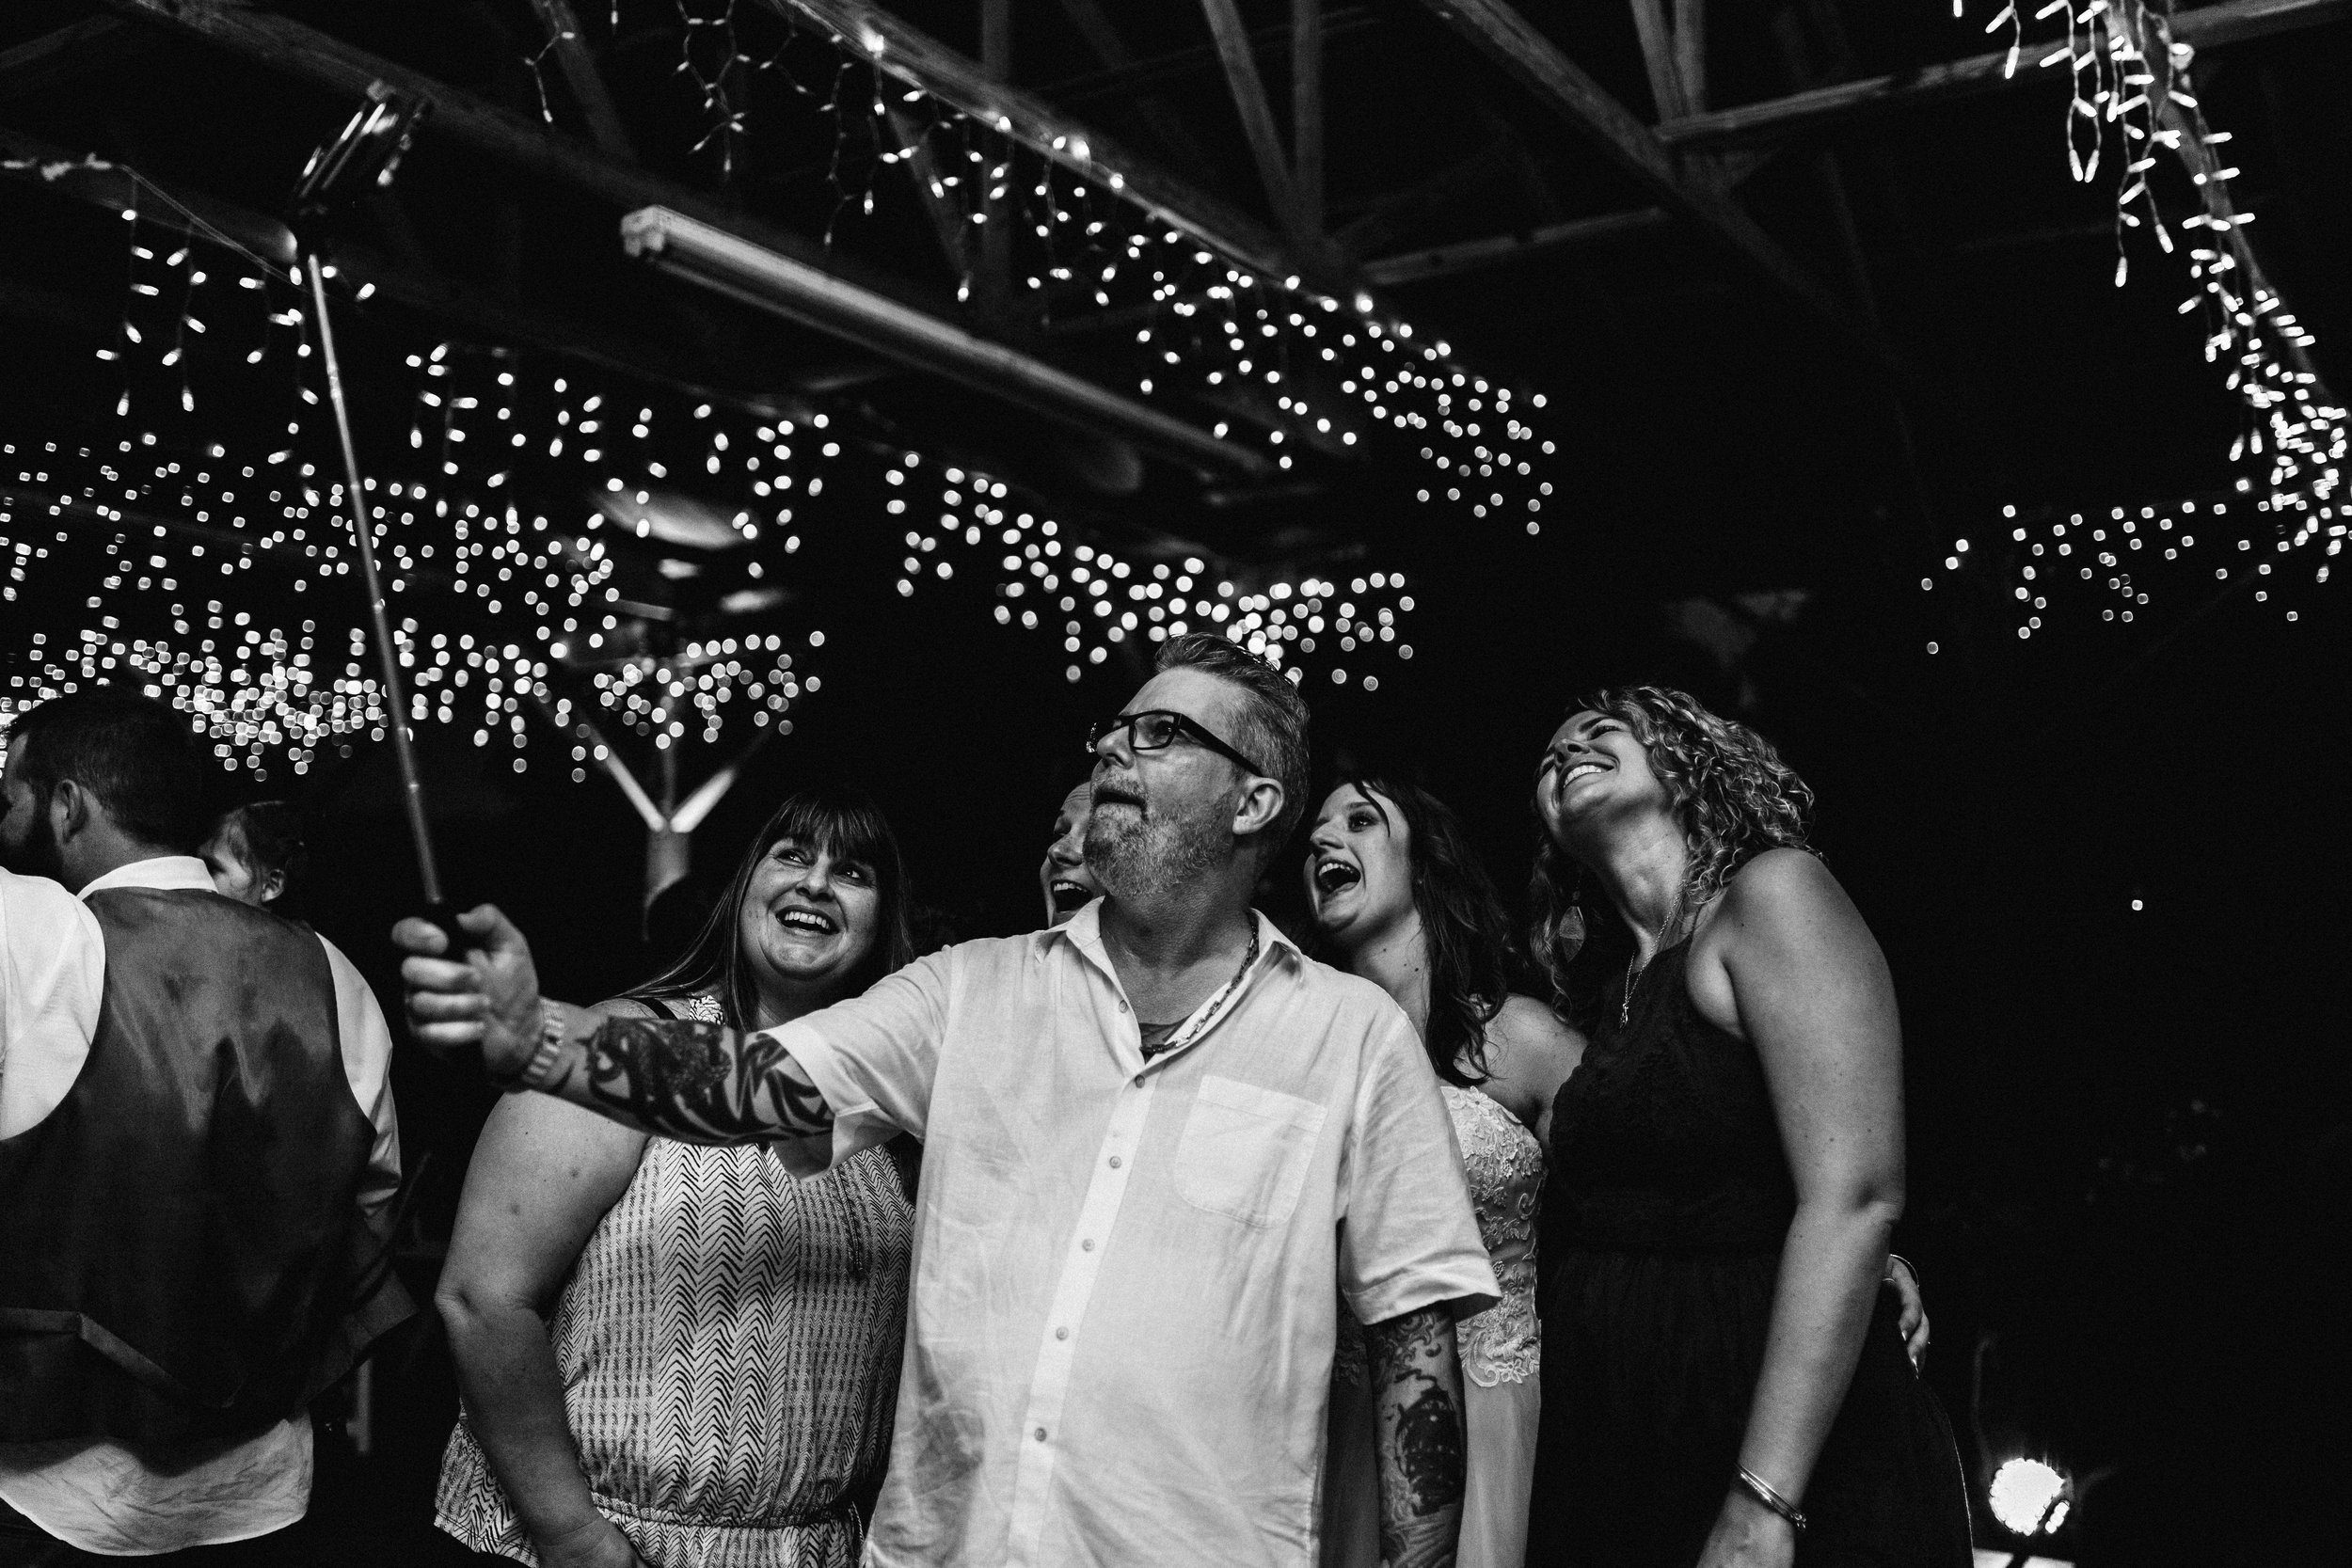 2017.10.14 Samantha and Matthew Crabtree Sarasota Wedding (587 of 708).jpg